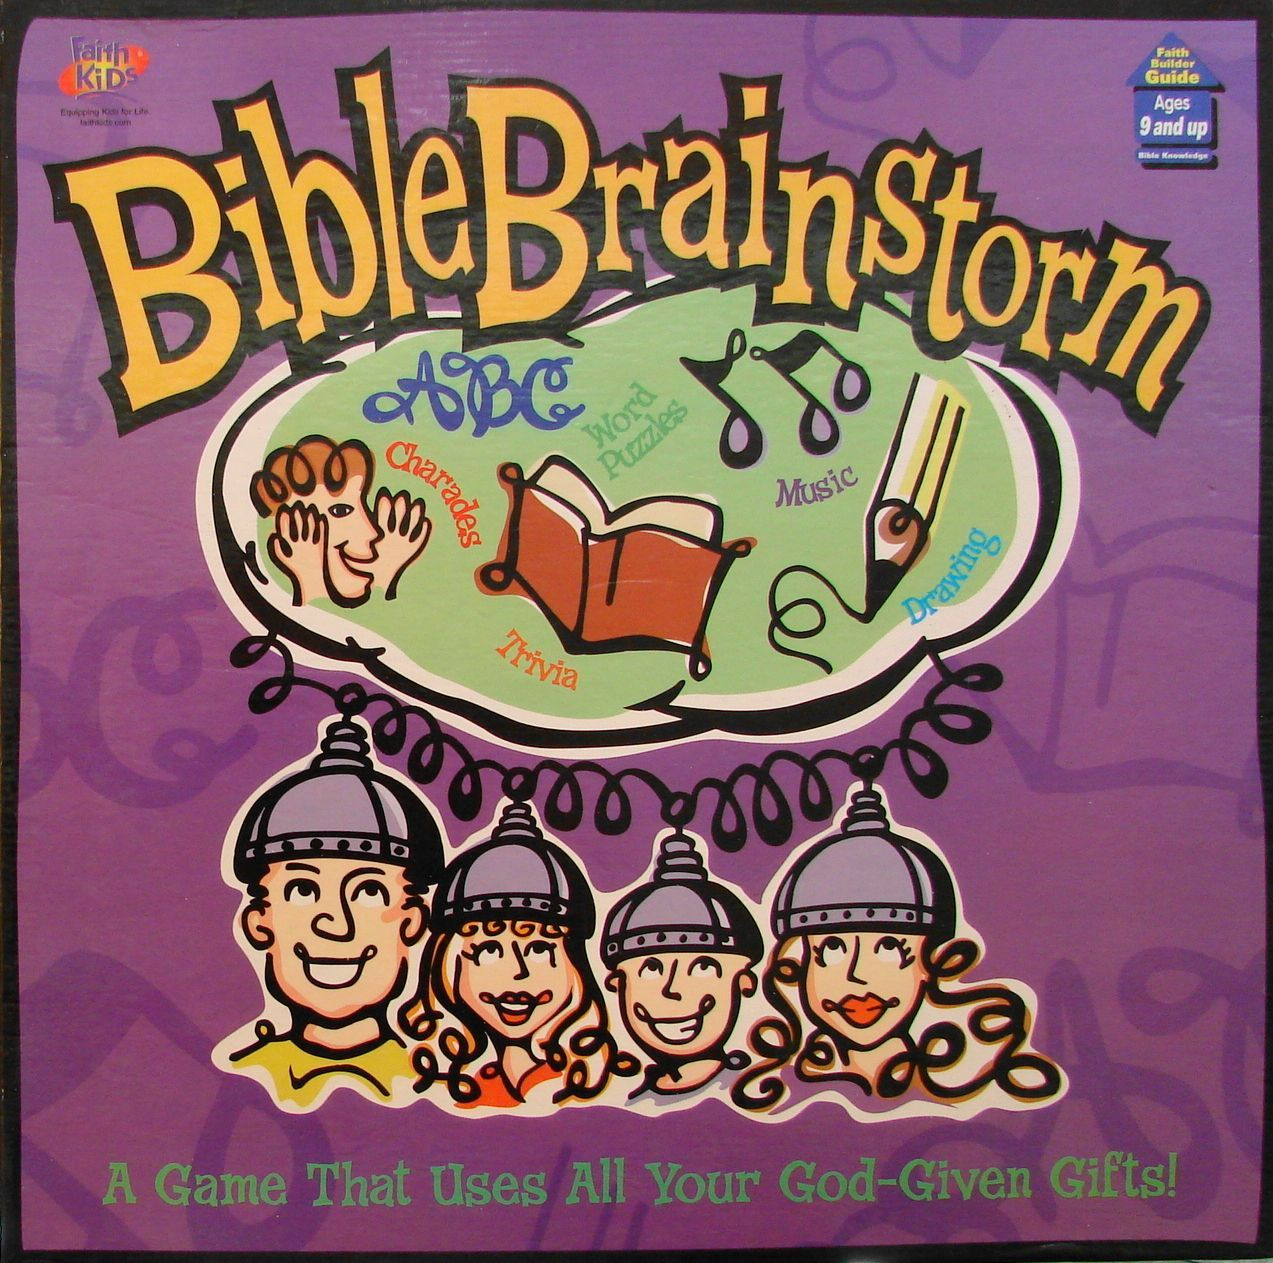 Bible Brainstorm